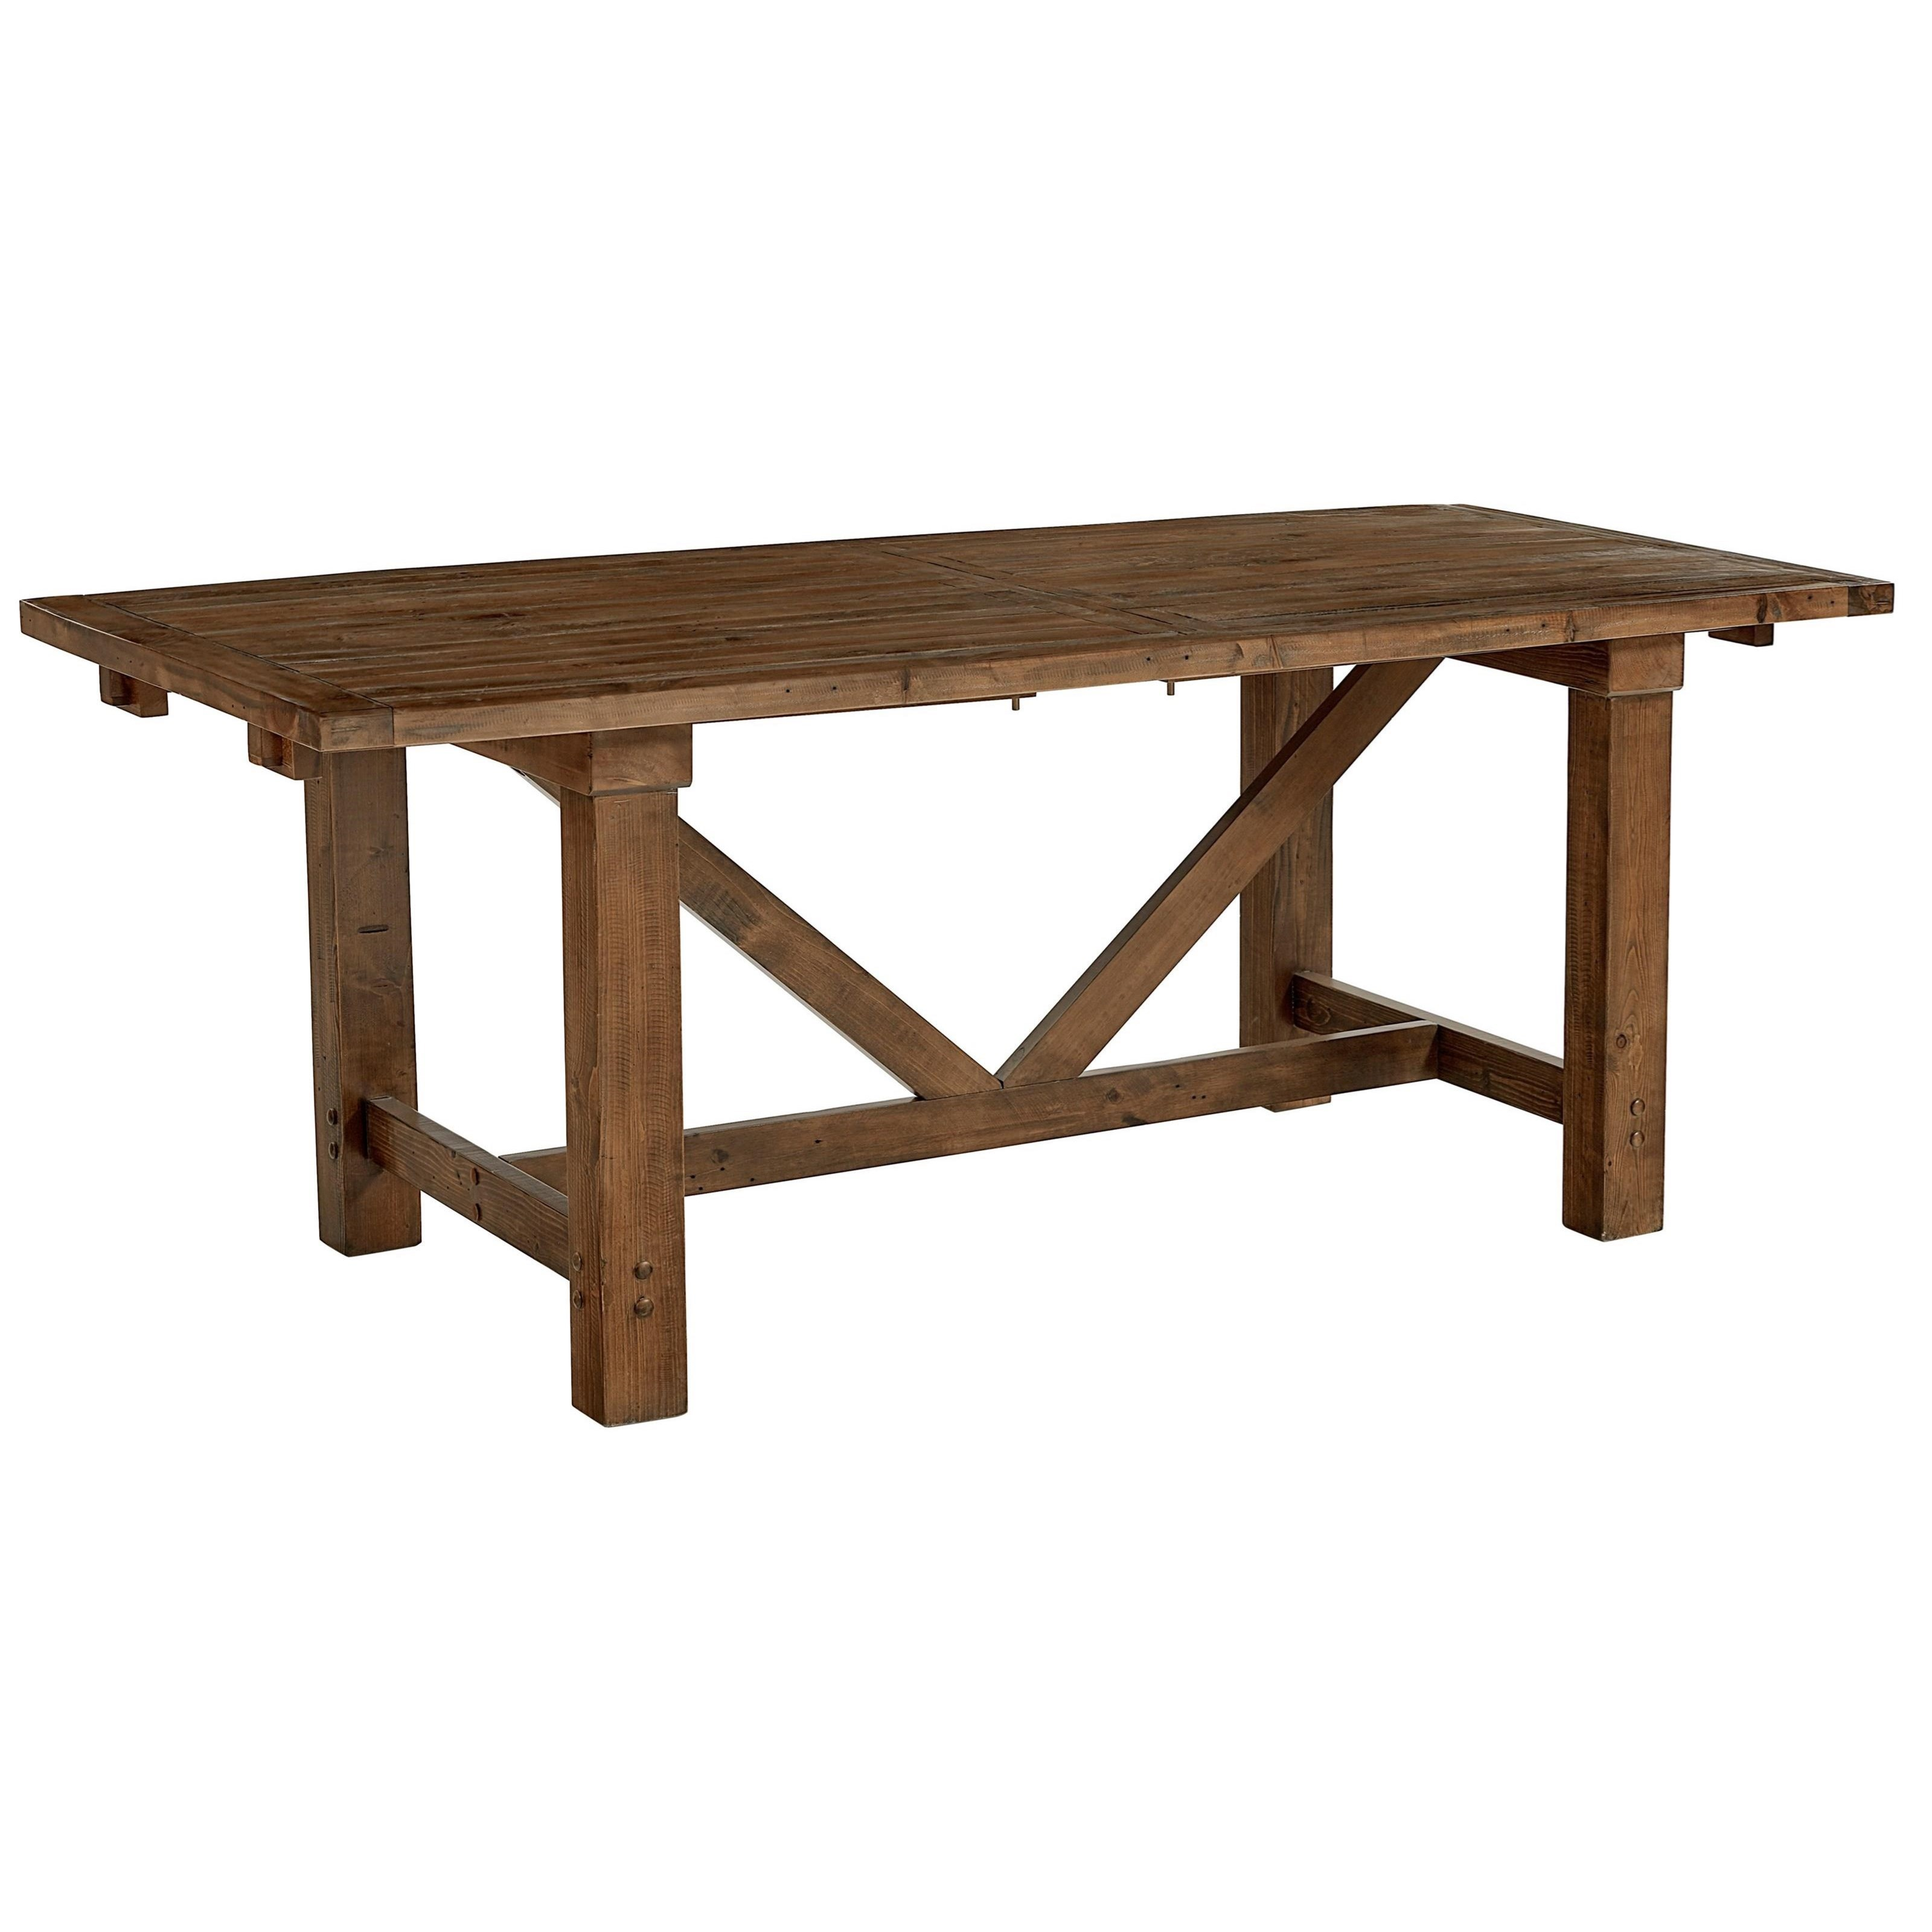 Wilder Dining Table by Progressive Furniture at Bullard Furniture